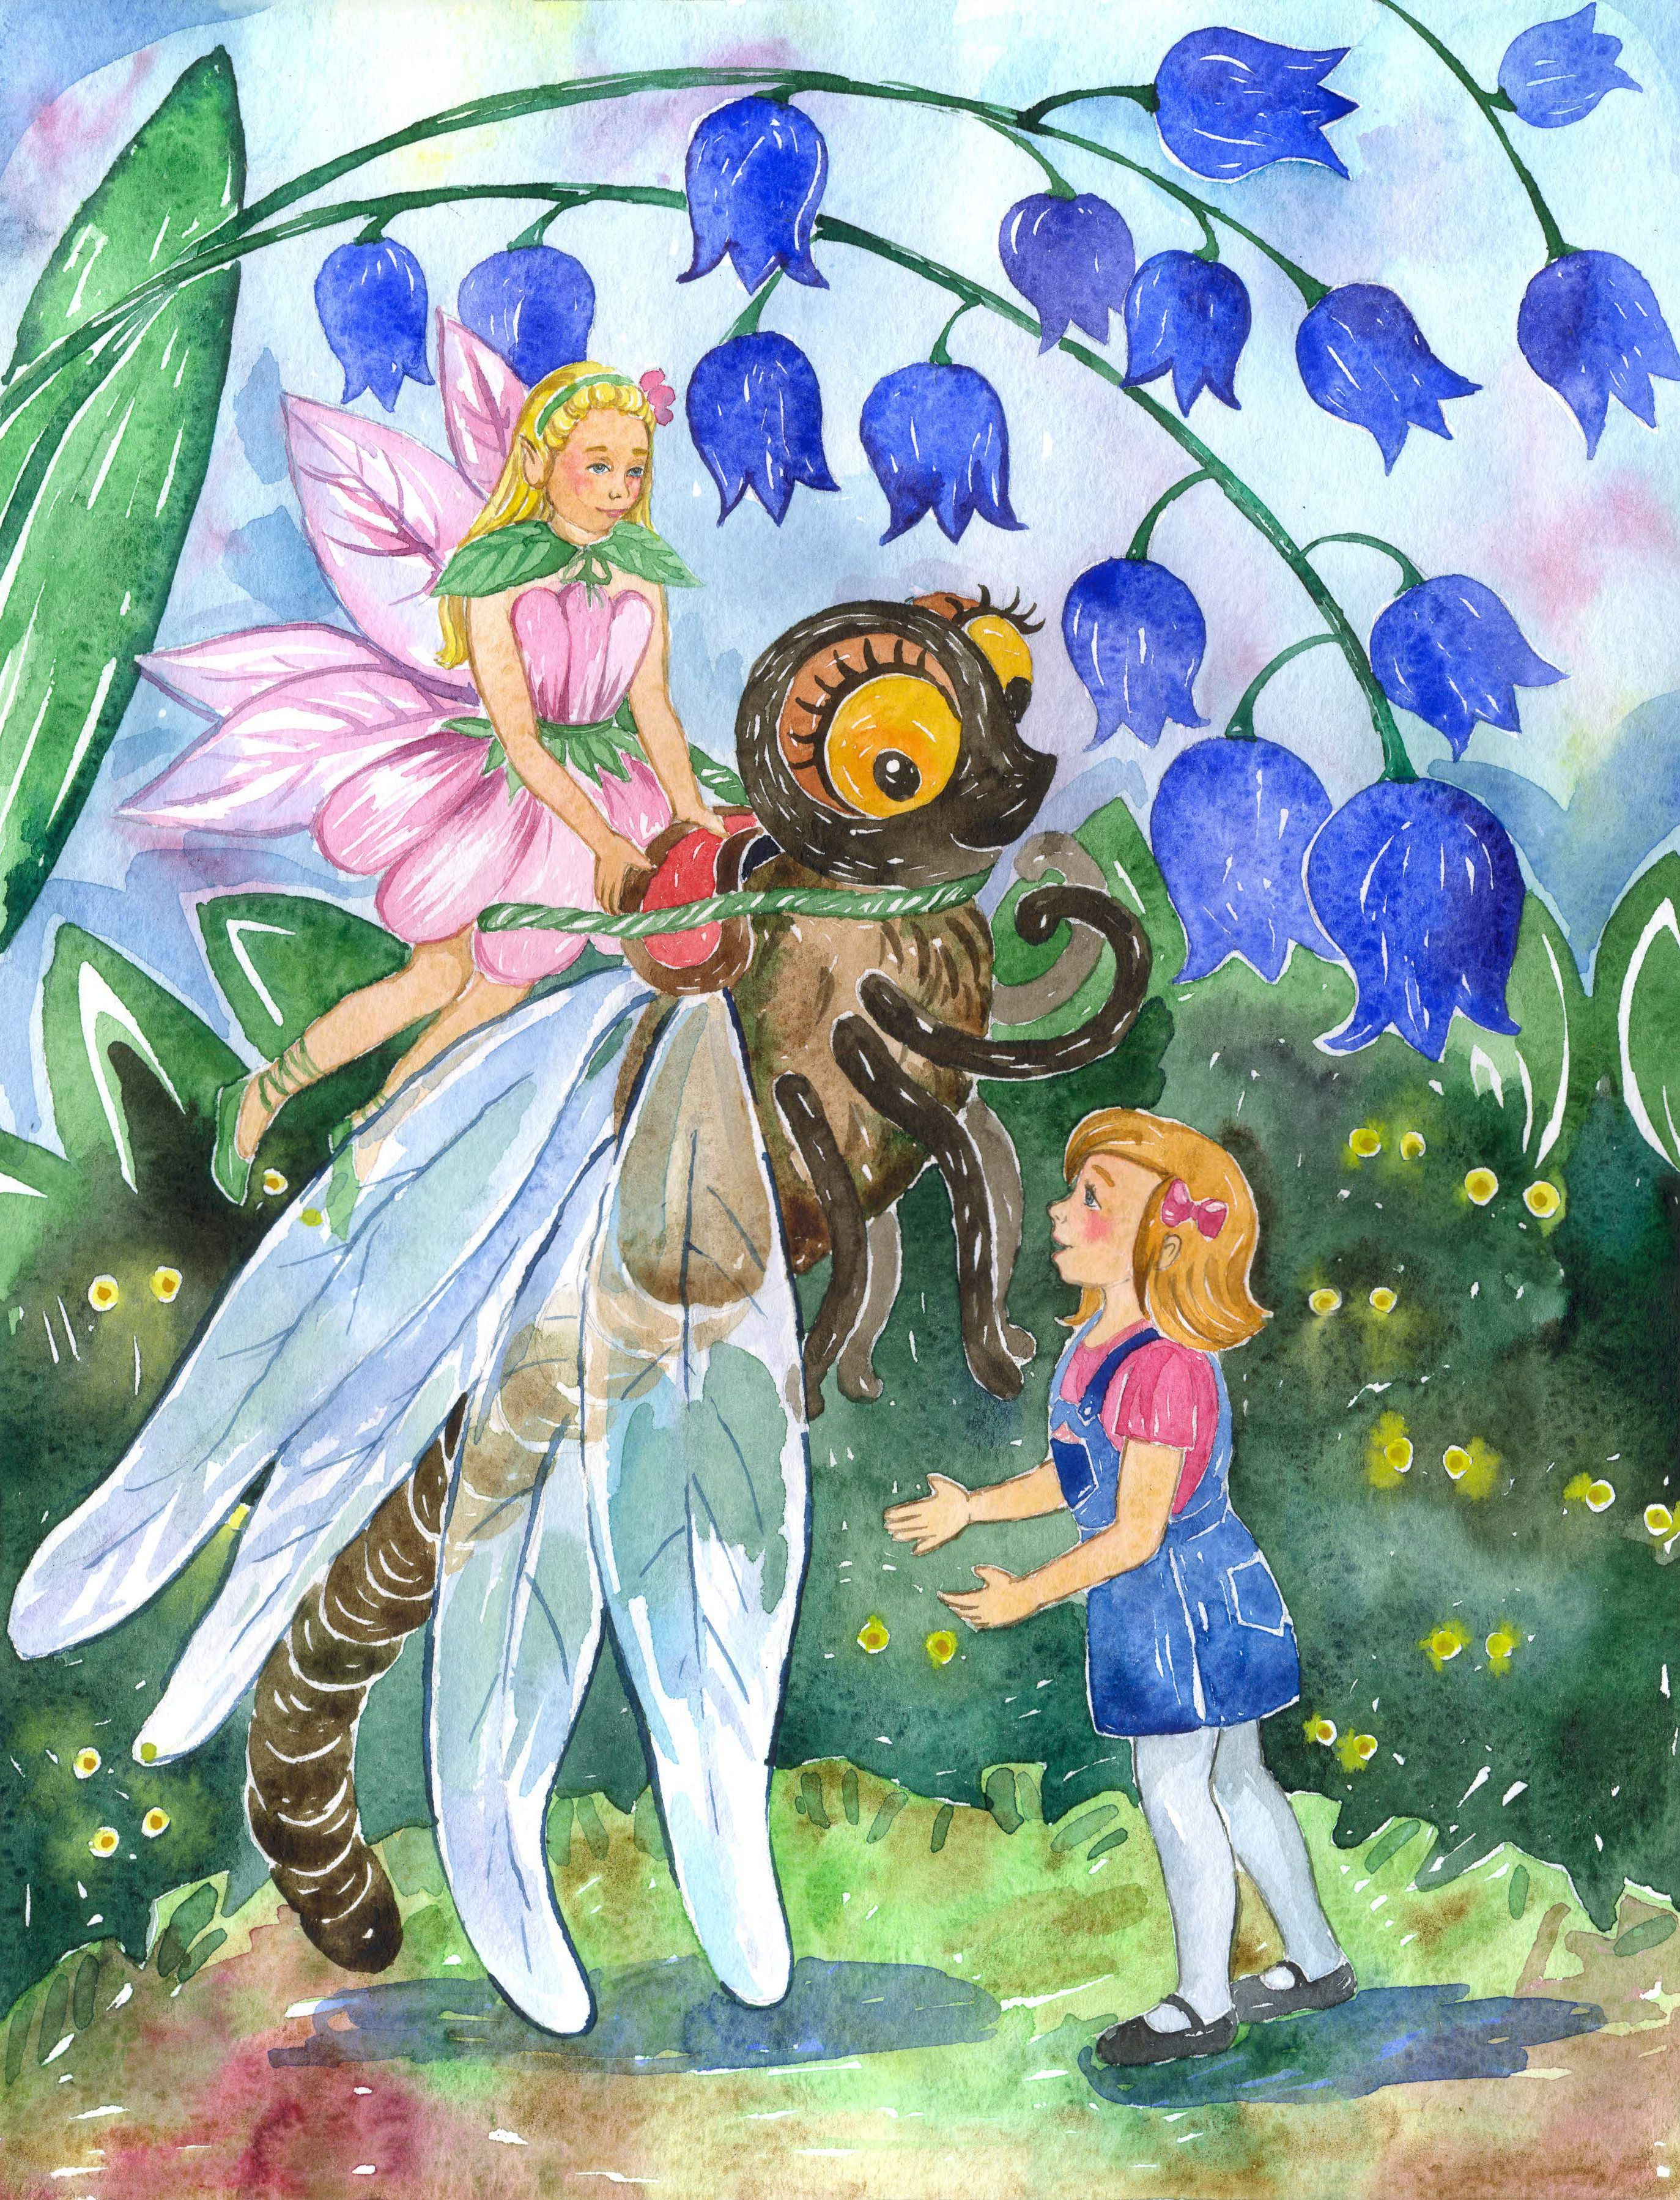 Sarah wants to fly like the fairies however, she tells Apple Blossom